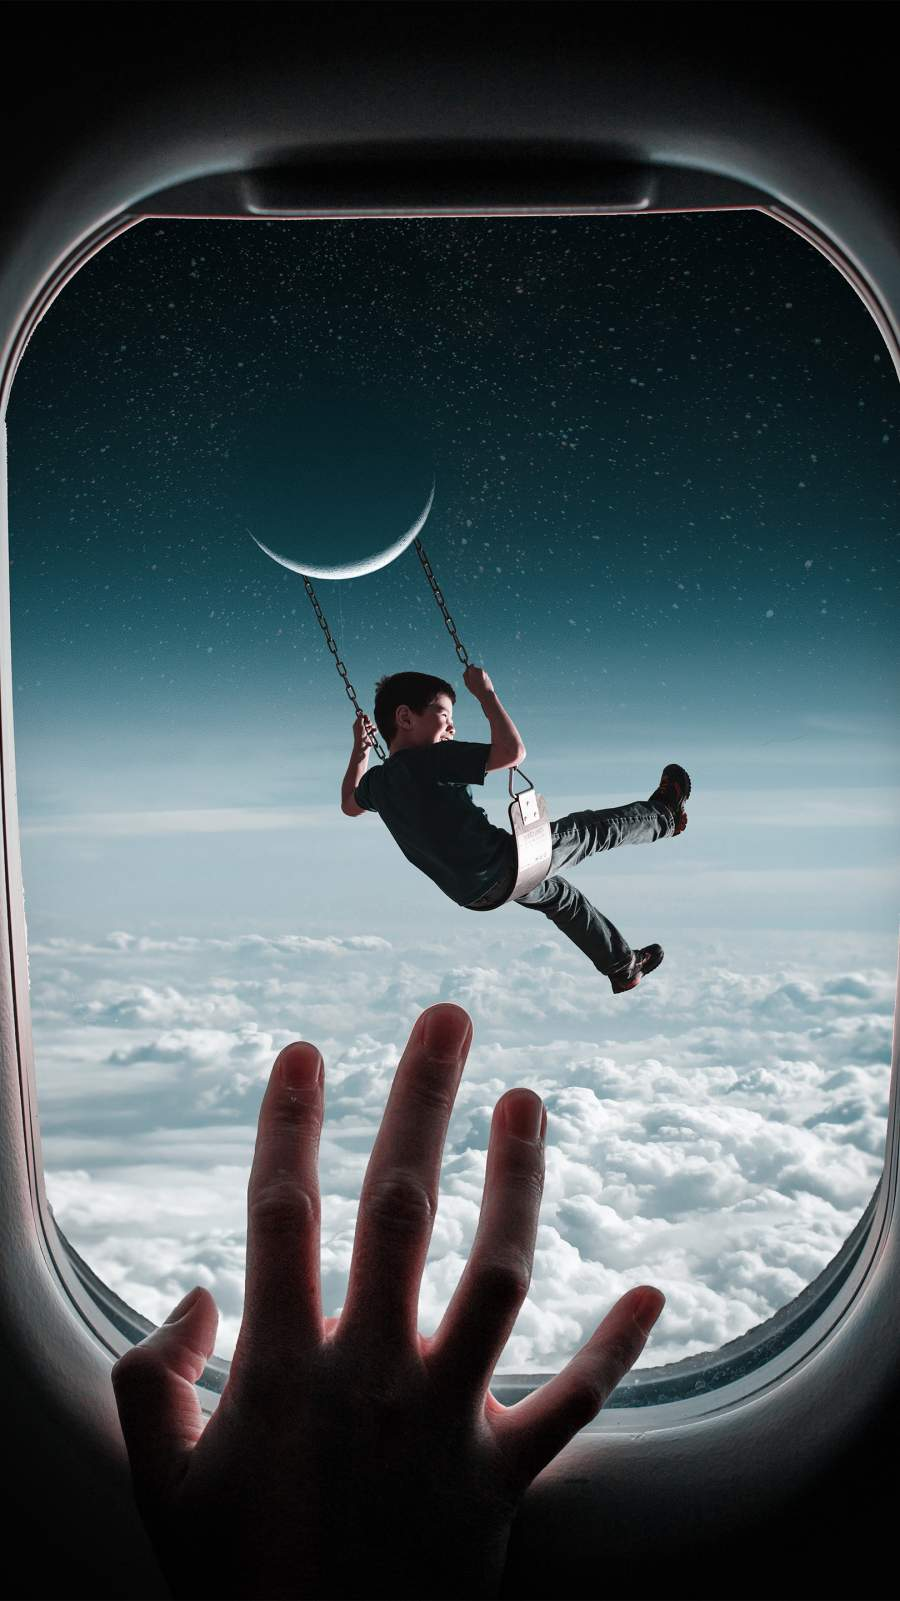 Sky Dreams iPhone Wallpaper